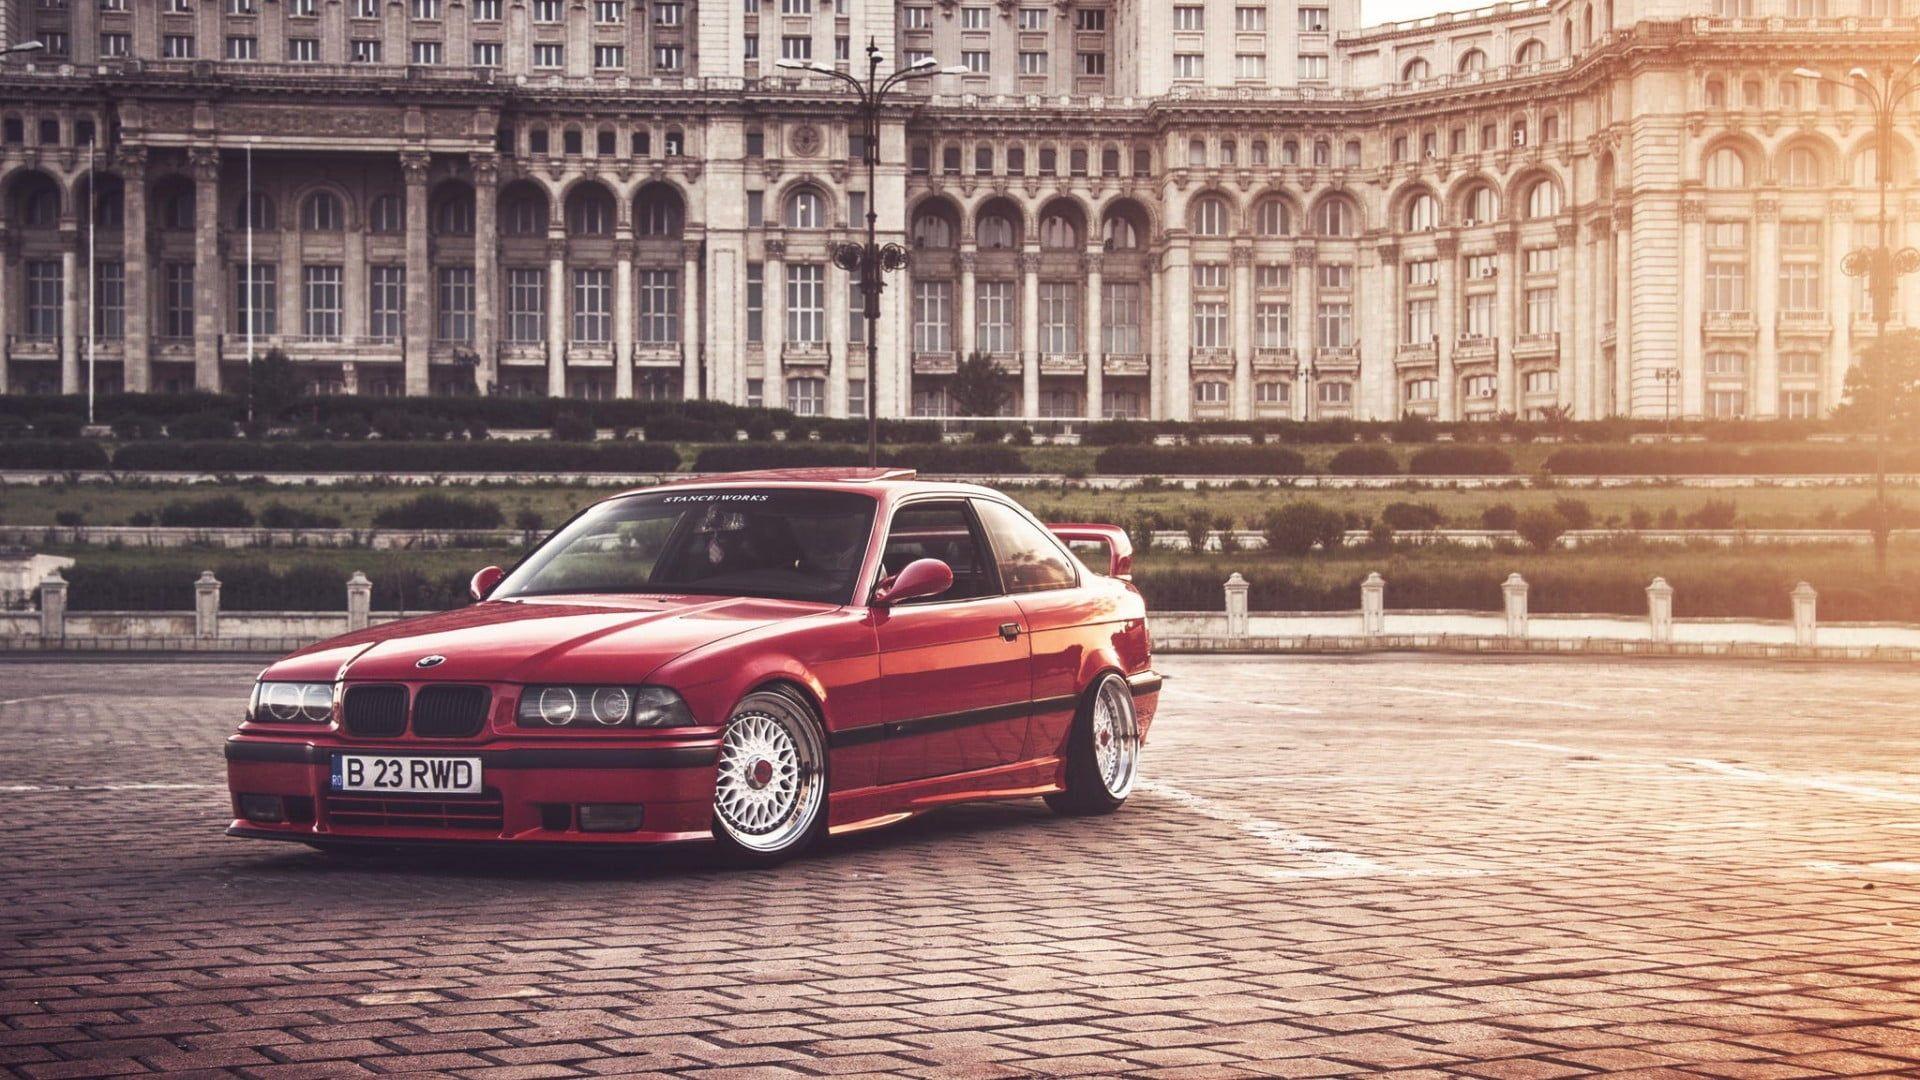 Red Bmw Coupe Bucharest Bmw E36 Stance Bmw 1080p Wallpaper Hdwallpaper Desktop In 2021 Bmw Bmw Coupe Bmw E36